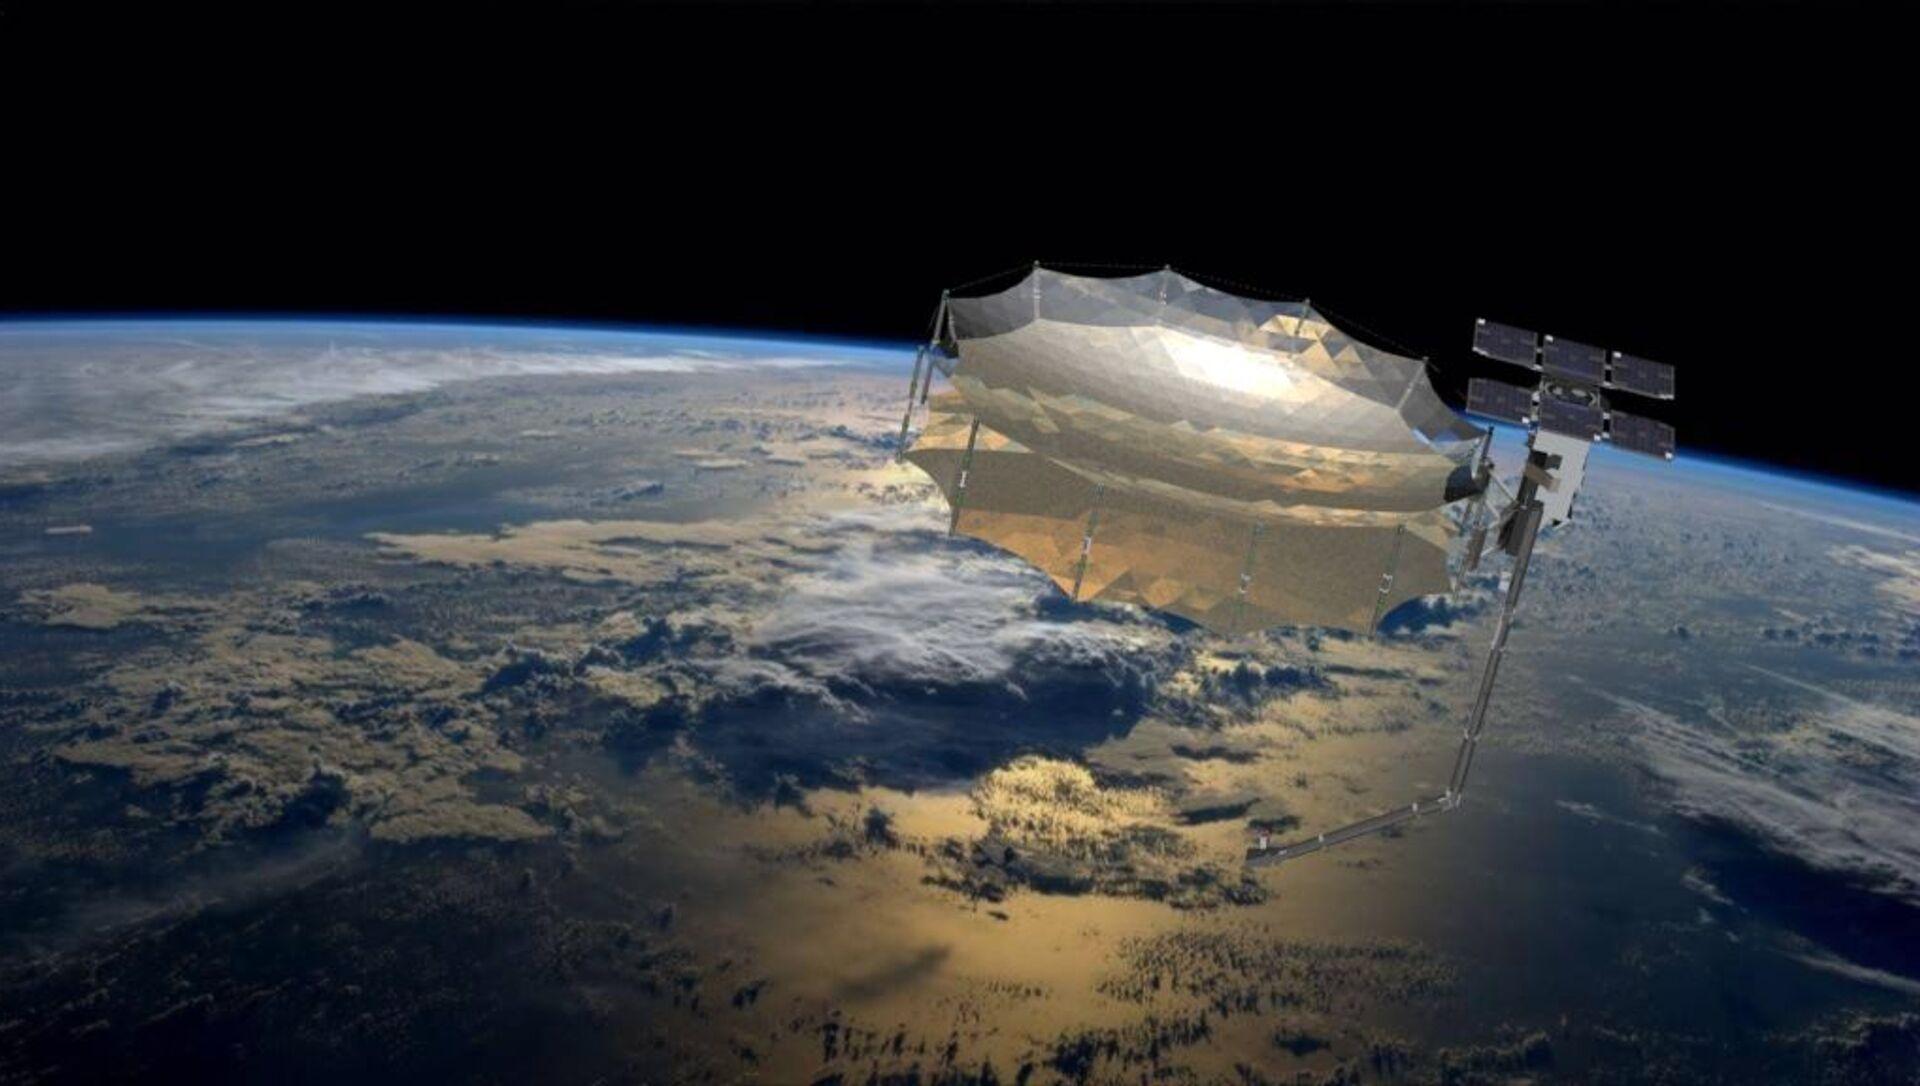 El satélite de Capella Space - Sputnik Mundo, 1920, 25.12.2020